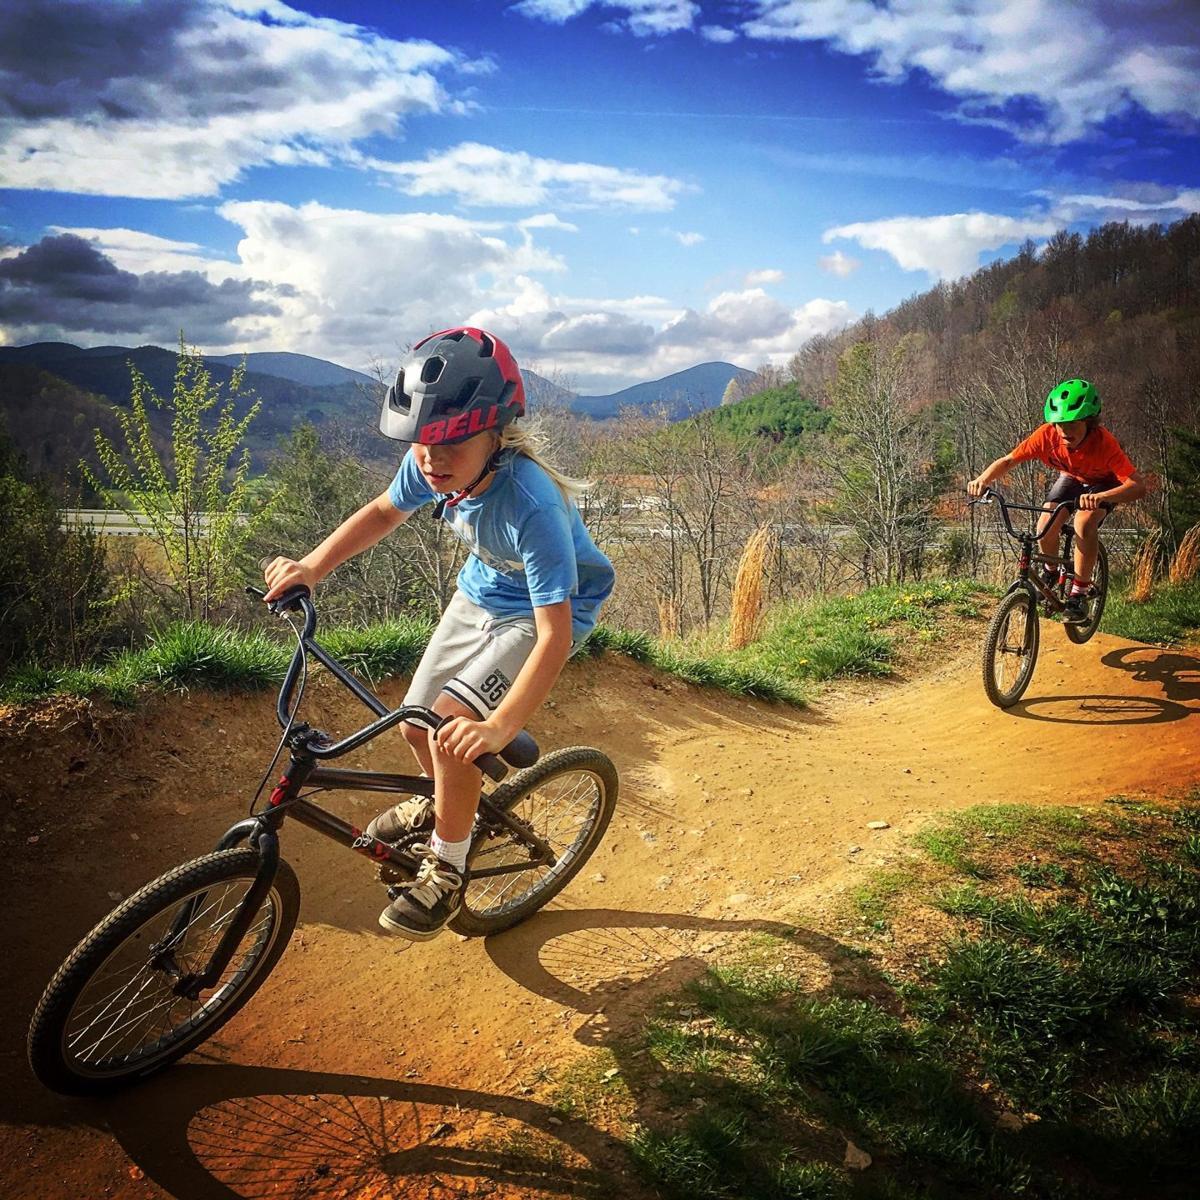 Taking On Mountain Biking Trails In The High Country Bike Highcountrync Com